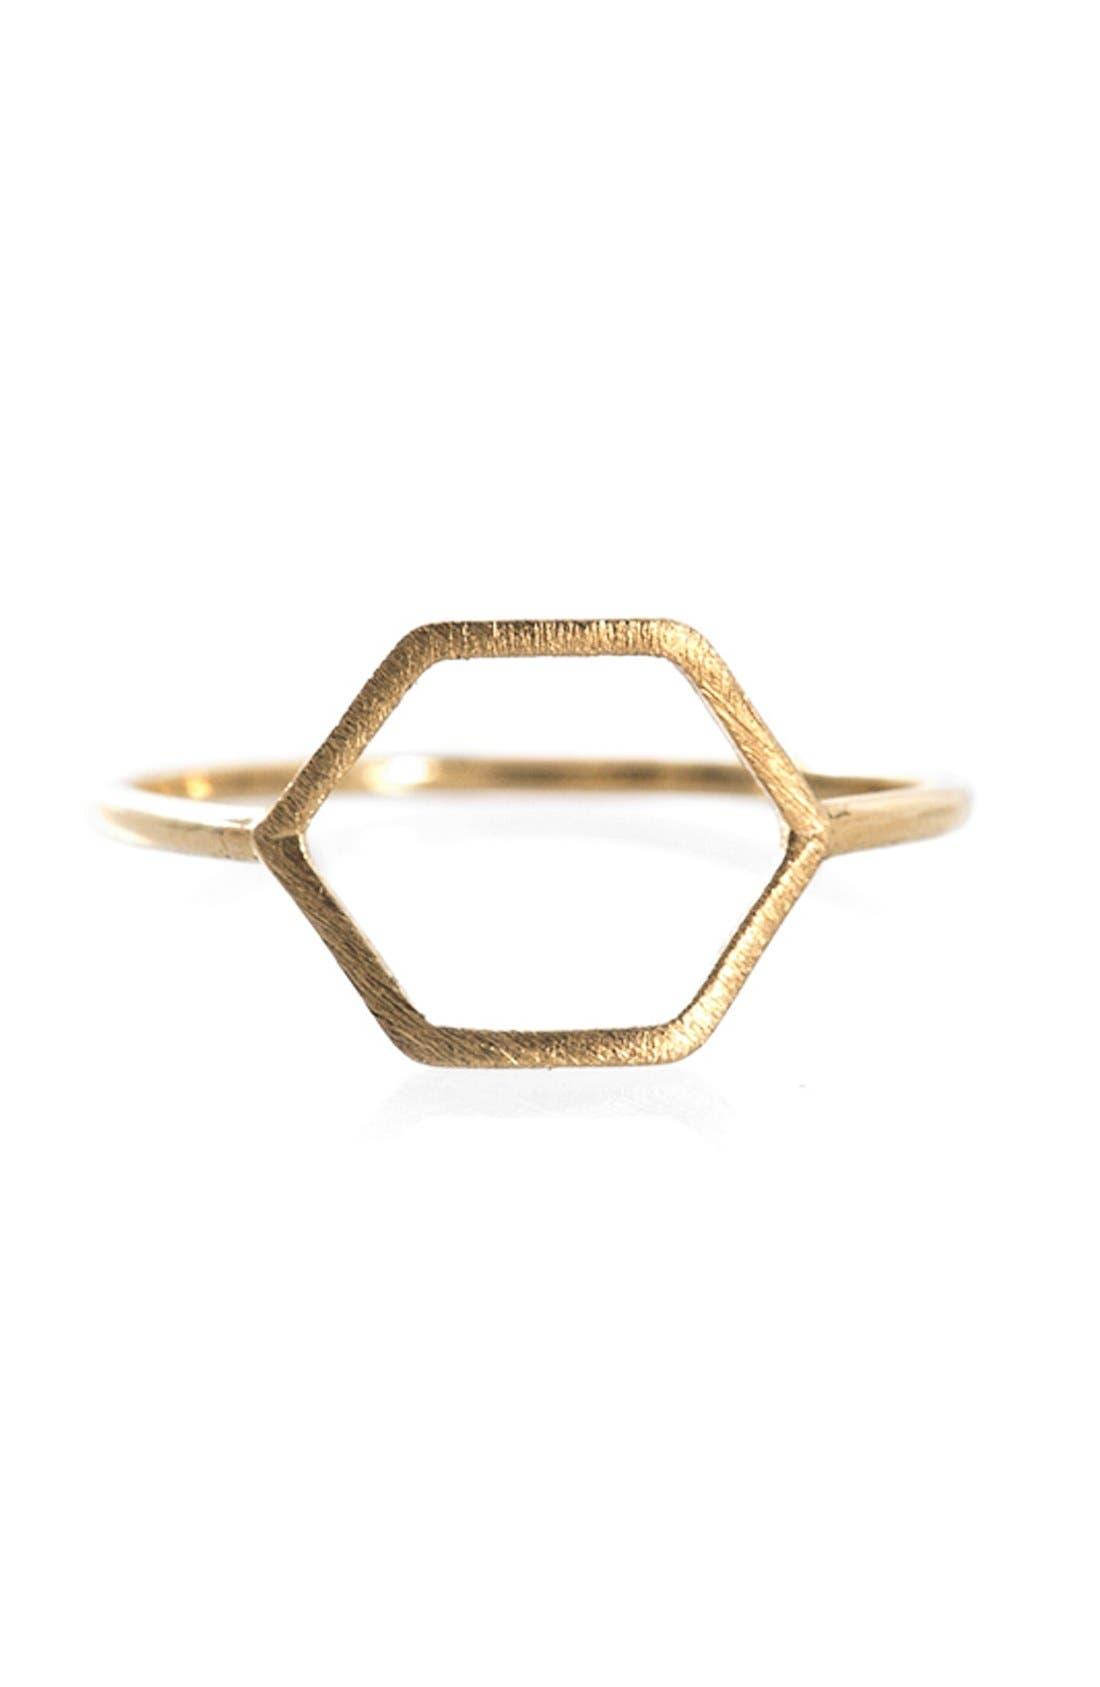 Main Image - Wanderlust + Co Hexagon Ring